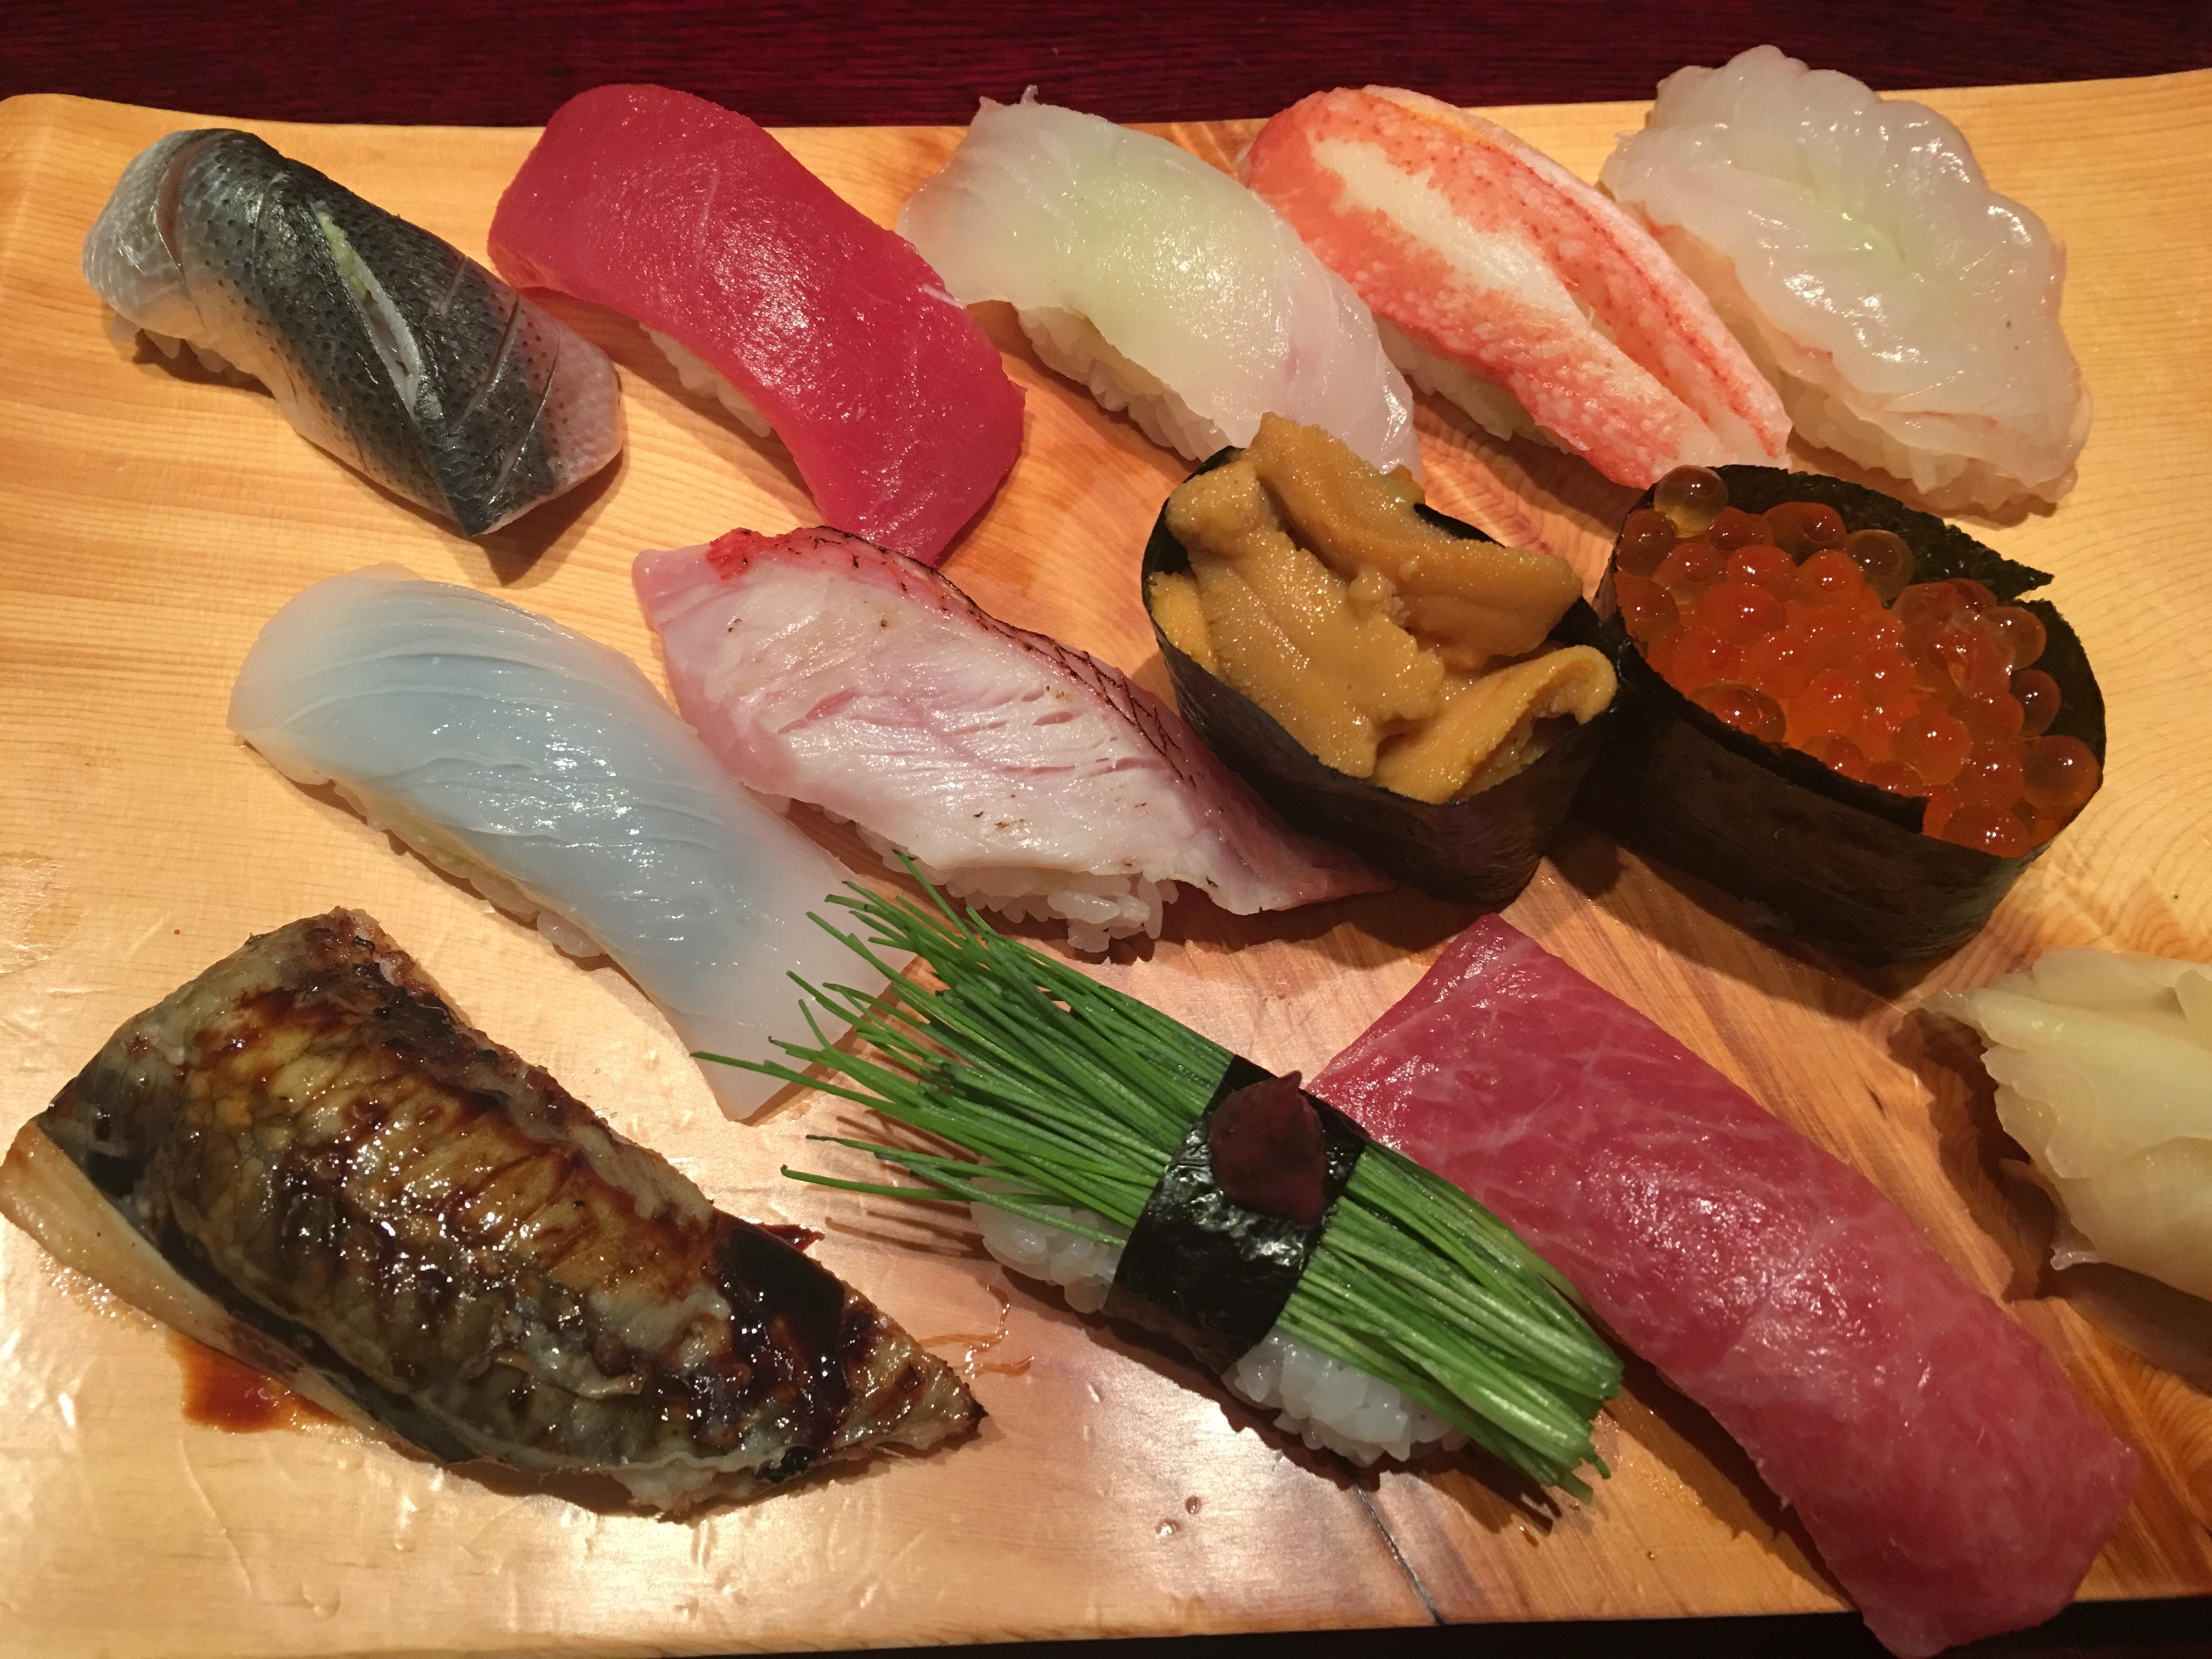 IMG_3635-e1487655195586 青森 東寿司でお寿司を楽しむ